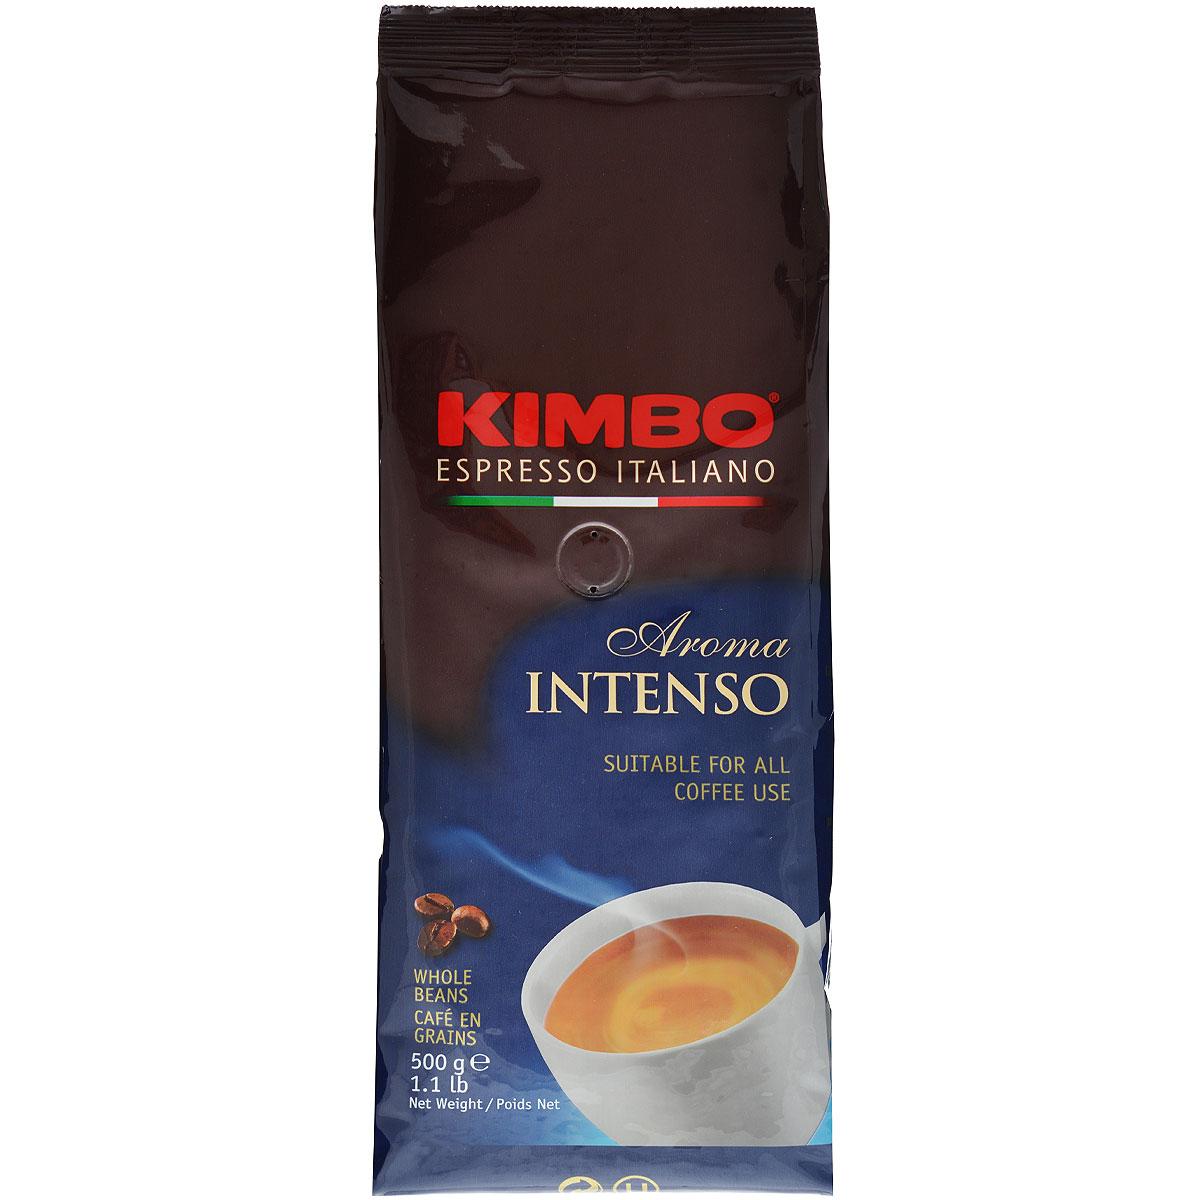 Kimbo Aroma Intenso кофе в зернах, 500 г цена